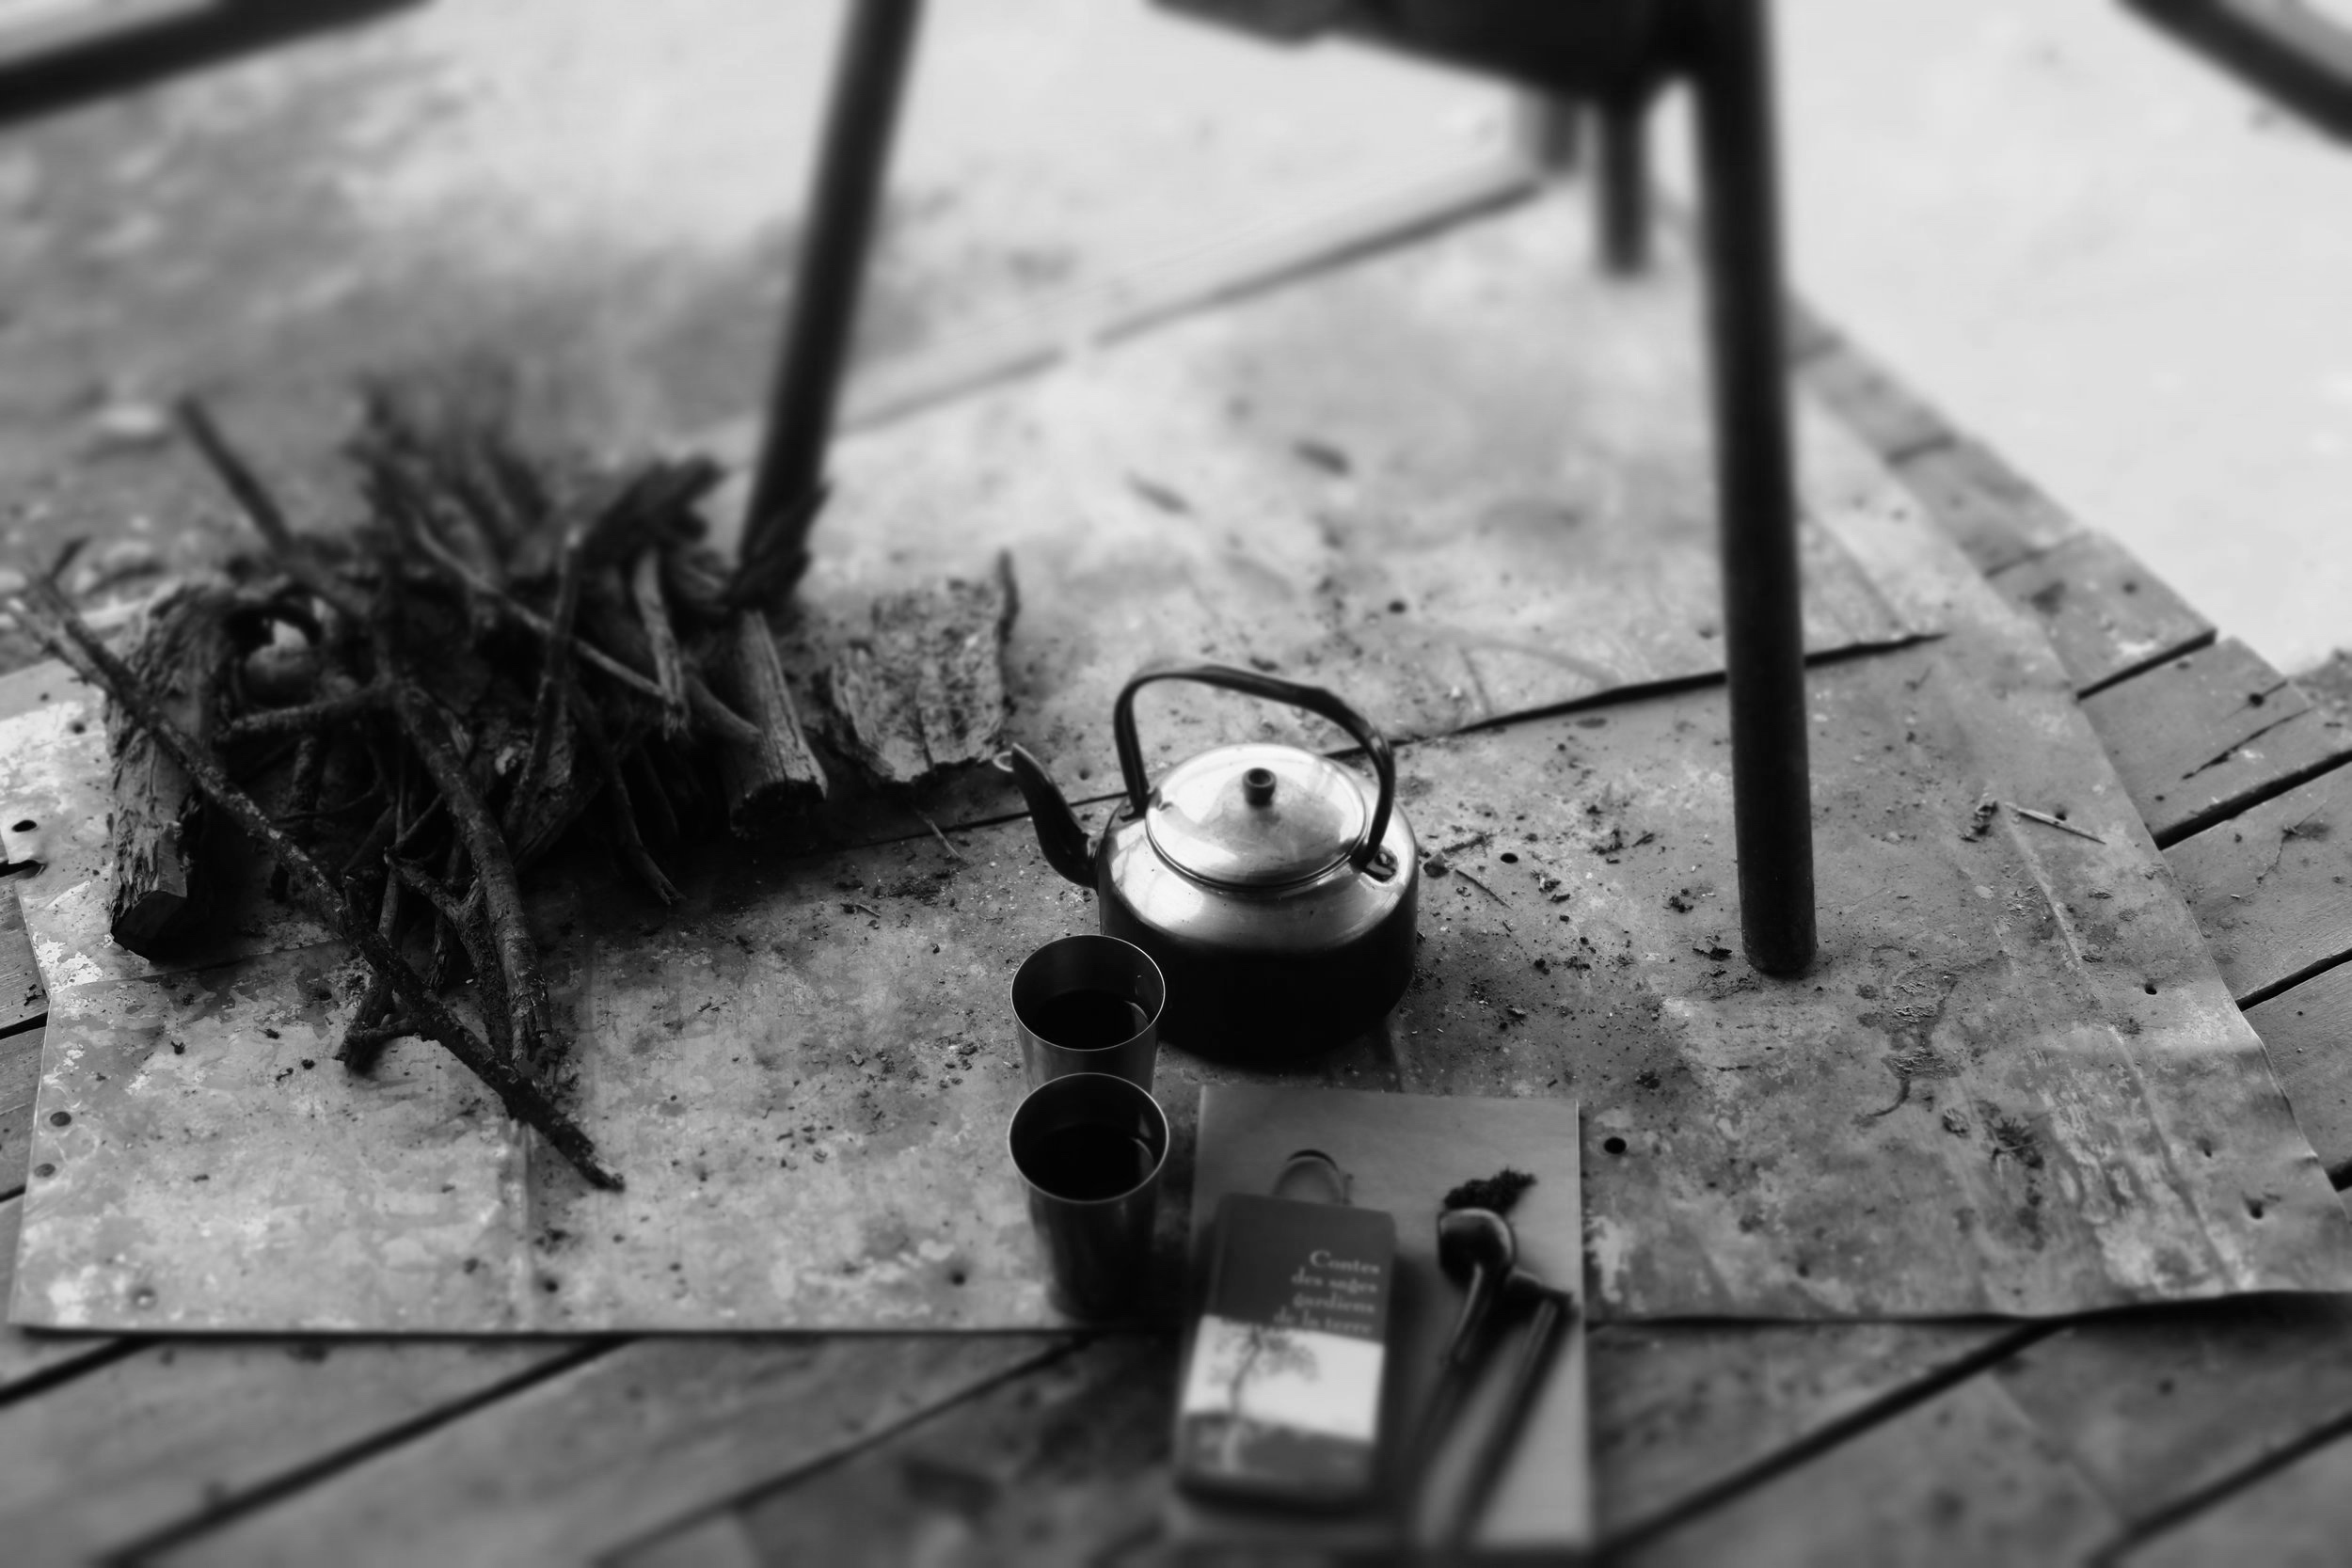 philippe gardent - severine perron - awa - asweare - speaker